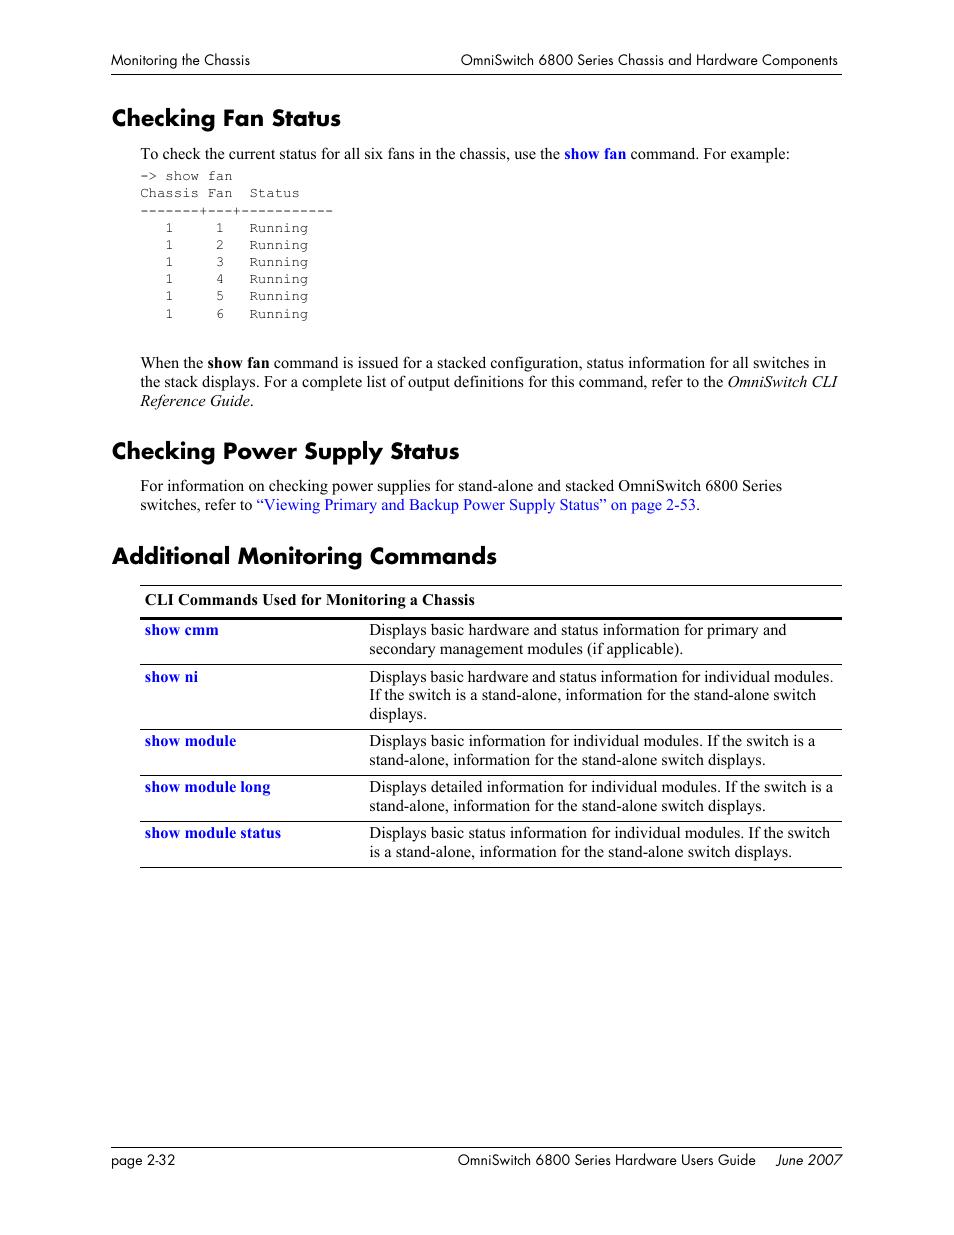 Alcatel Lucent Cli Commands